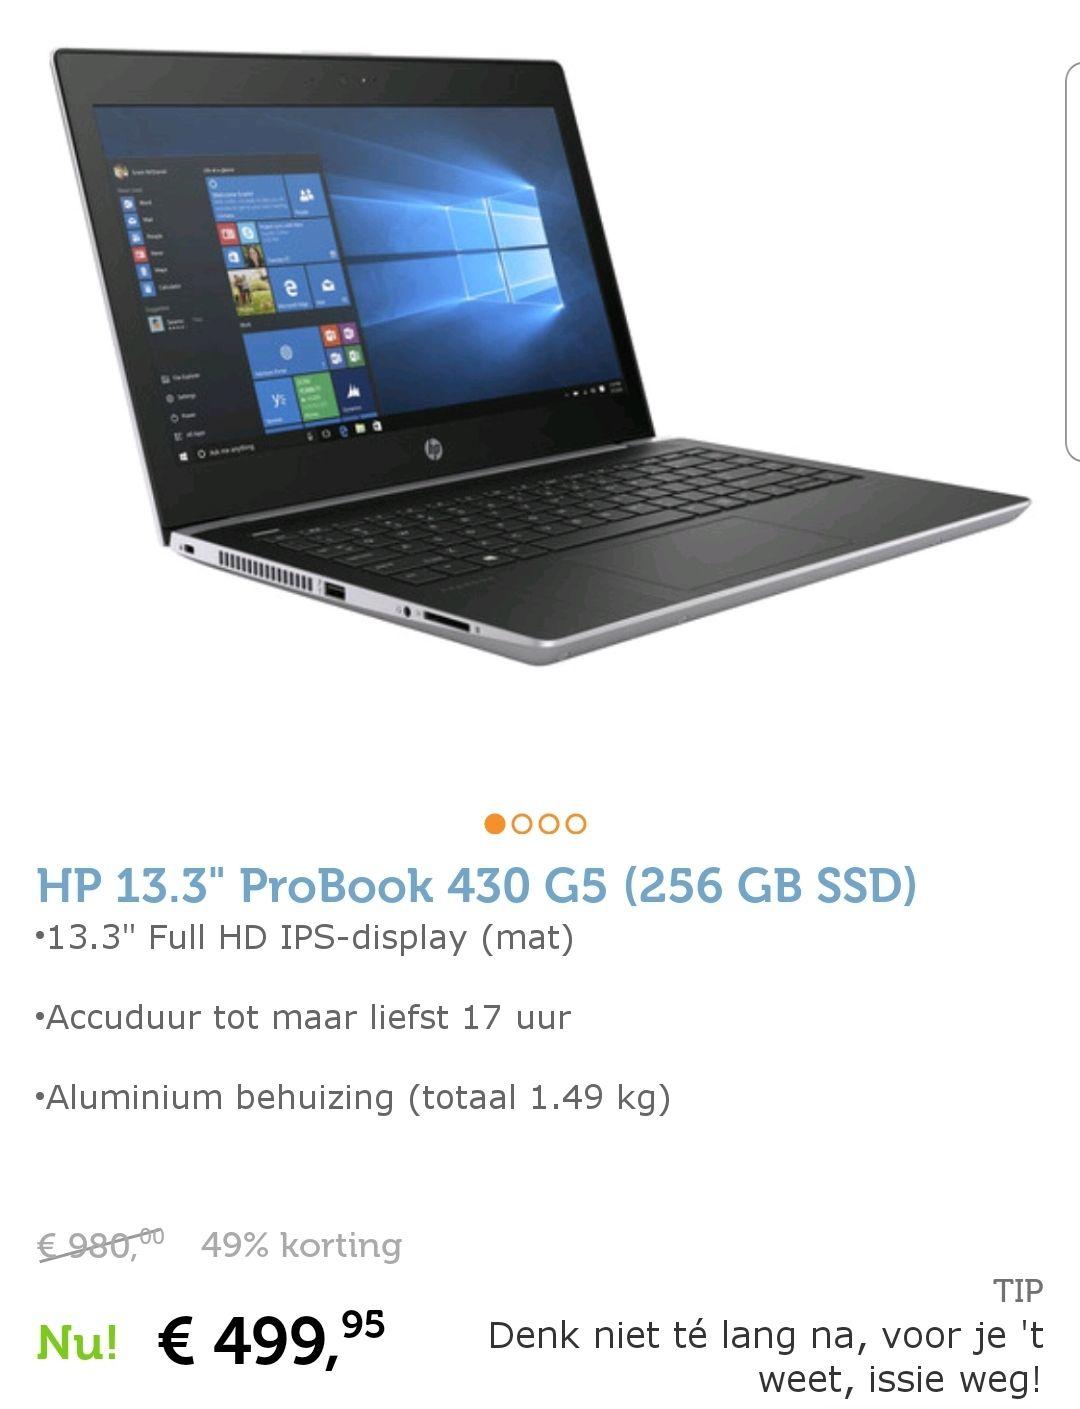 "HP 13.3"" ProBook 430 G5 (256 GB SSD)"